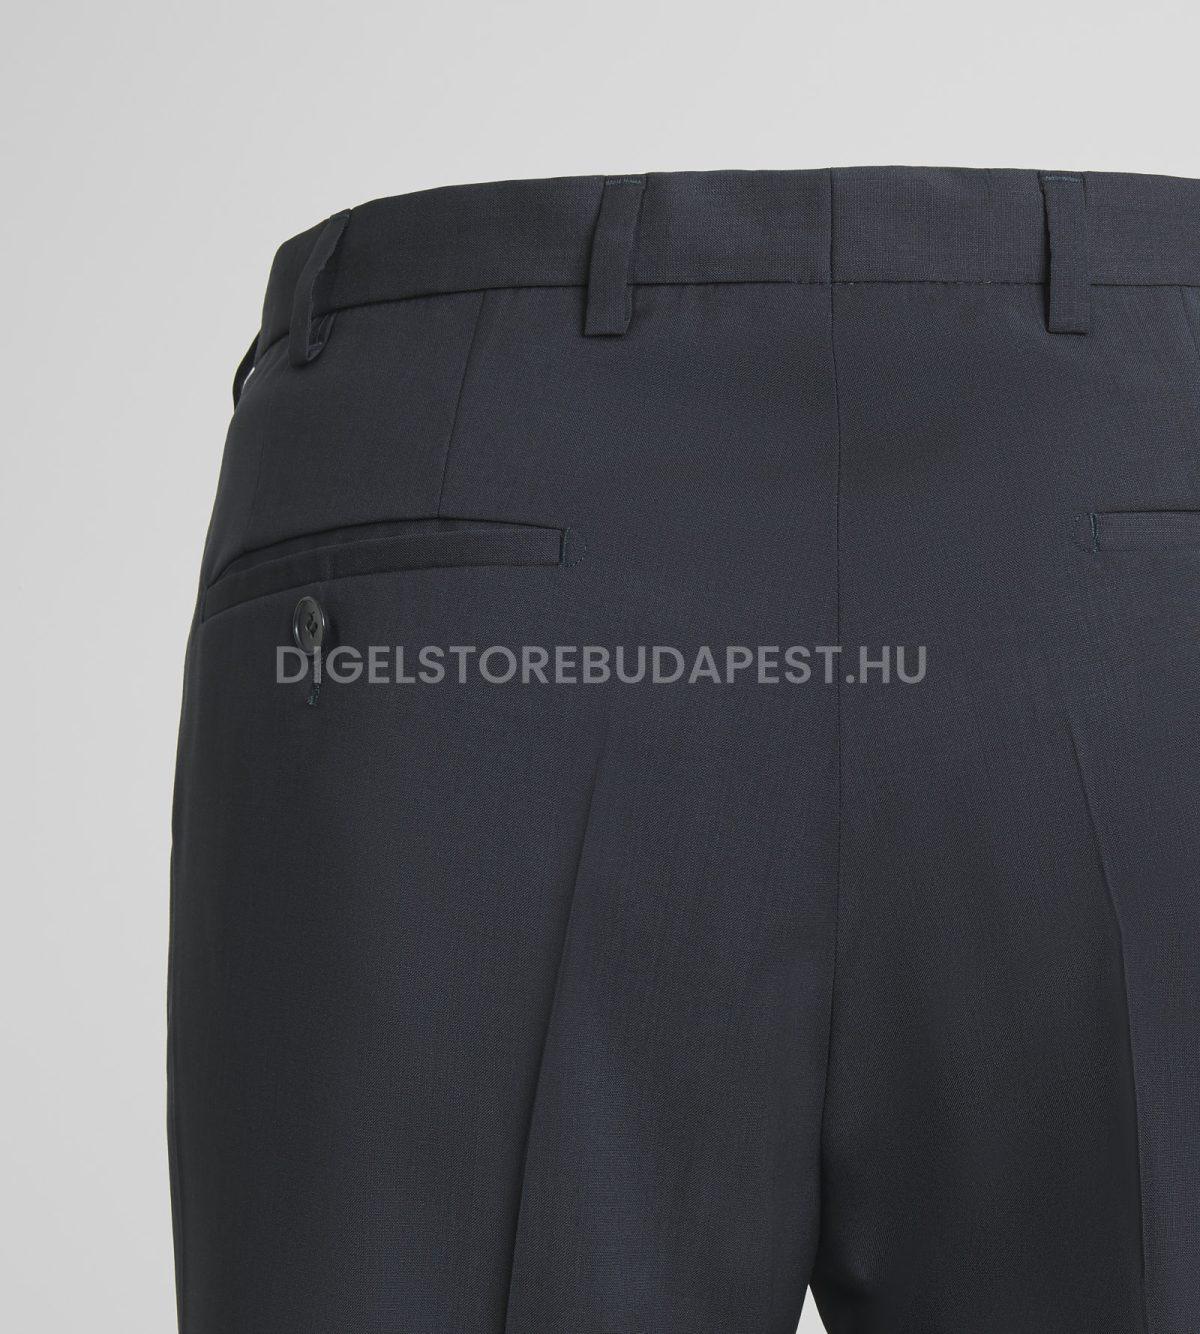 move-sotetkek-slim-fit-tiszta-gyapju-szovetnadrag-apollo-99832-20